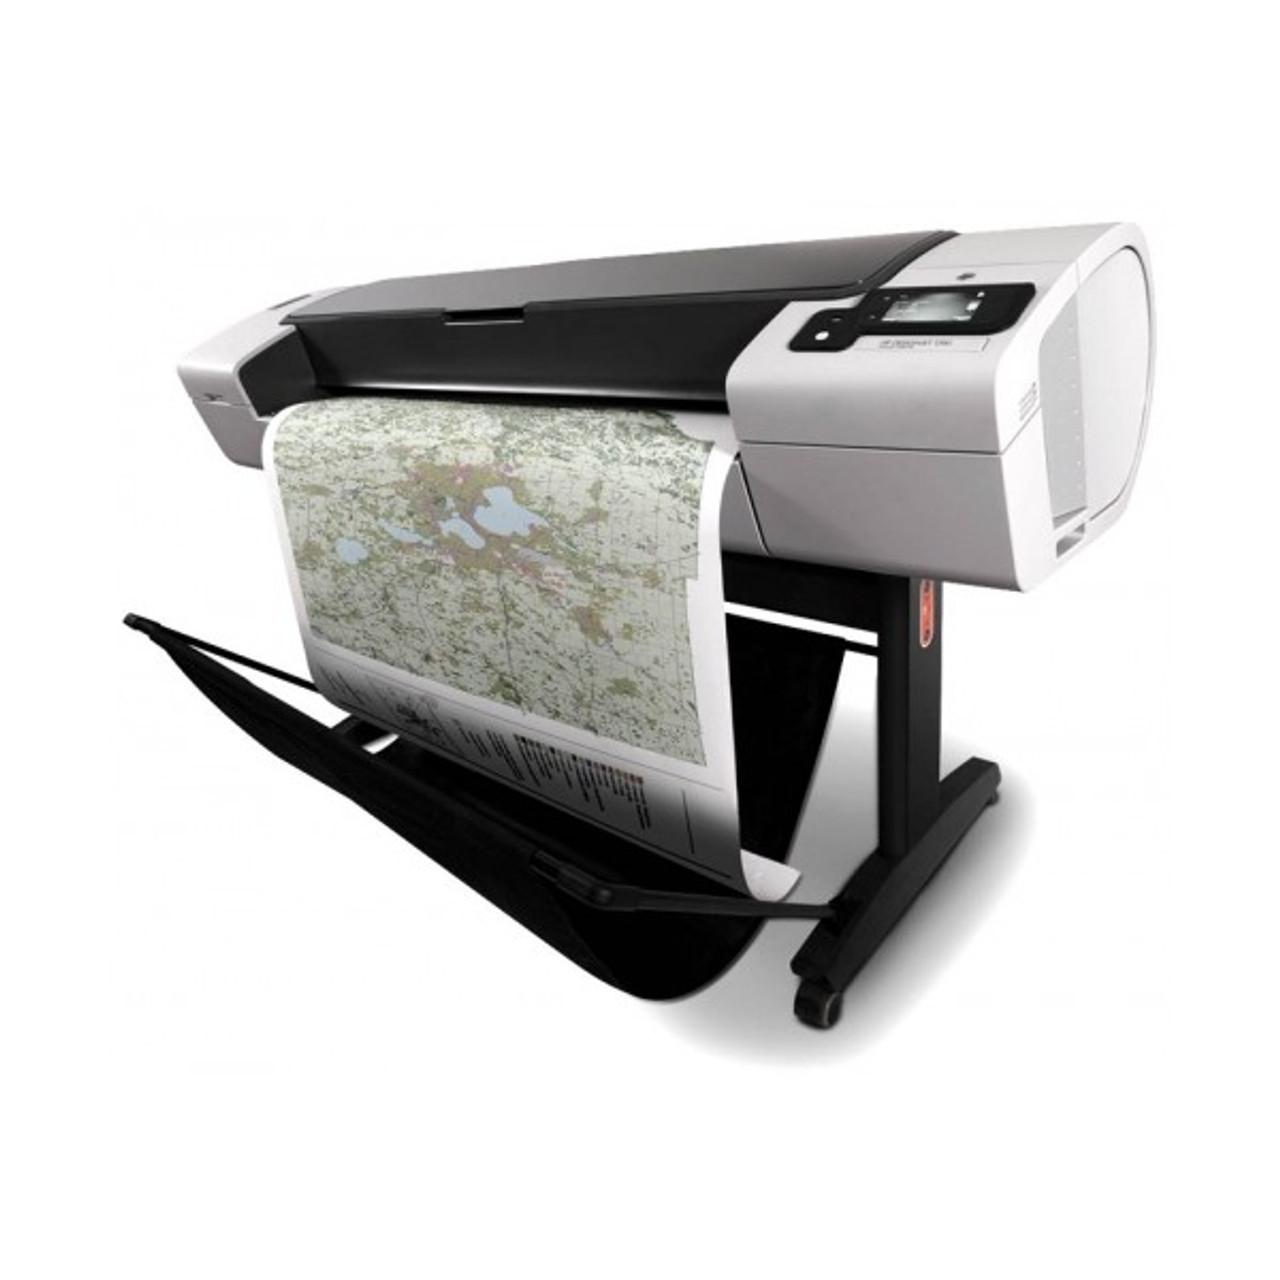 HP DesignJet T770 - CQ305A - HP Plotter for Sale